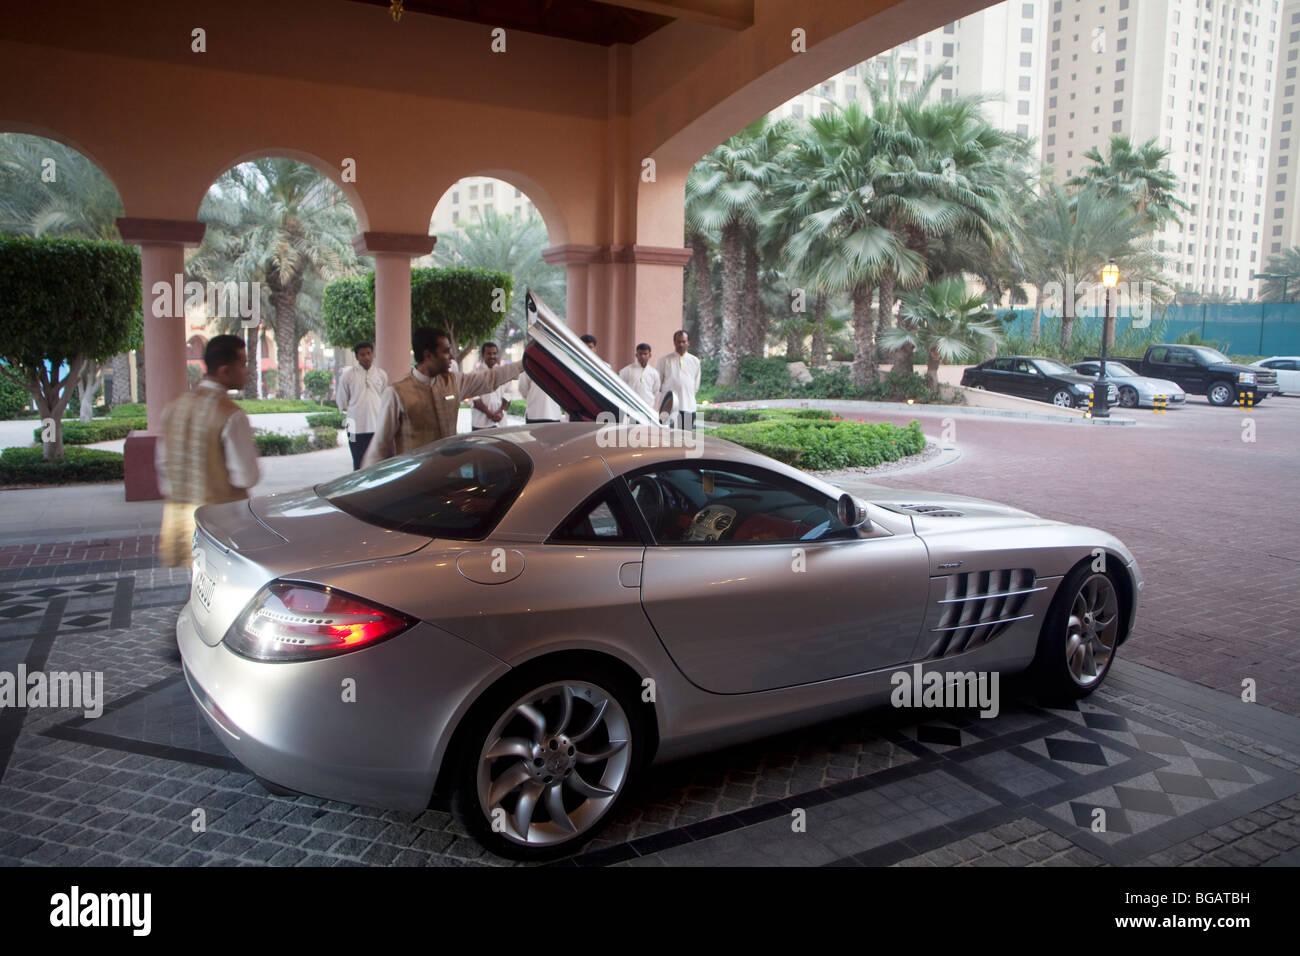 Sport Car At The Ritz Carlton Hotel, Dubai, United Arabian Emirates